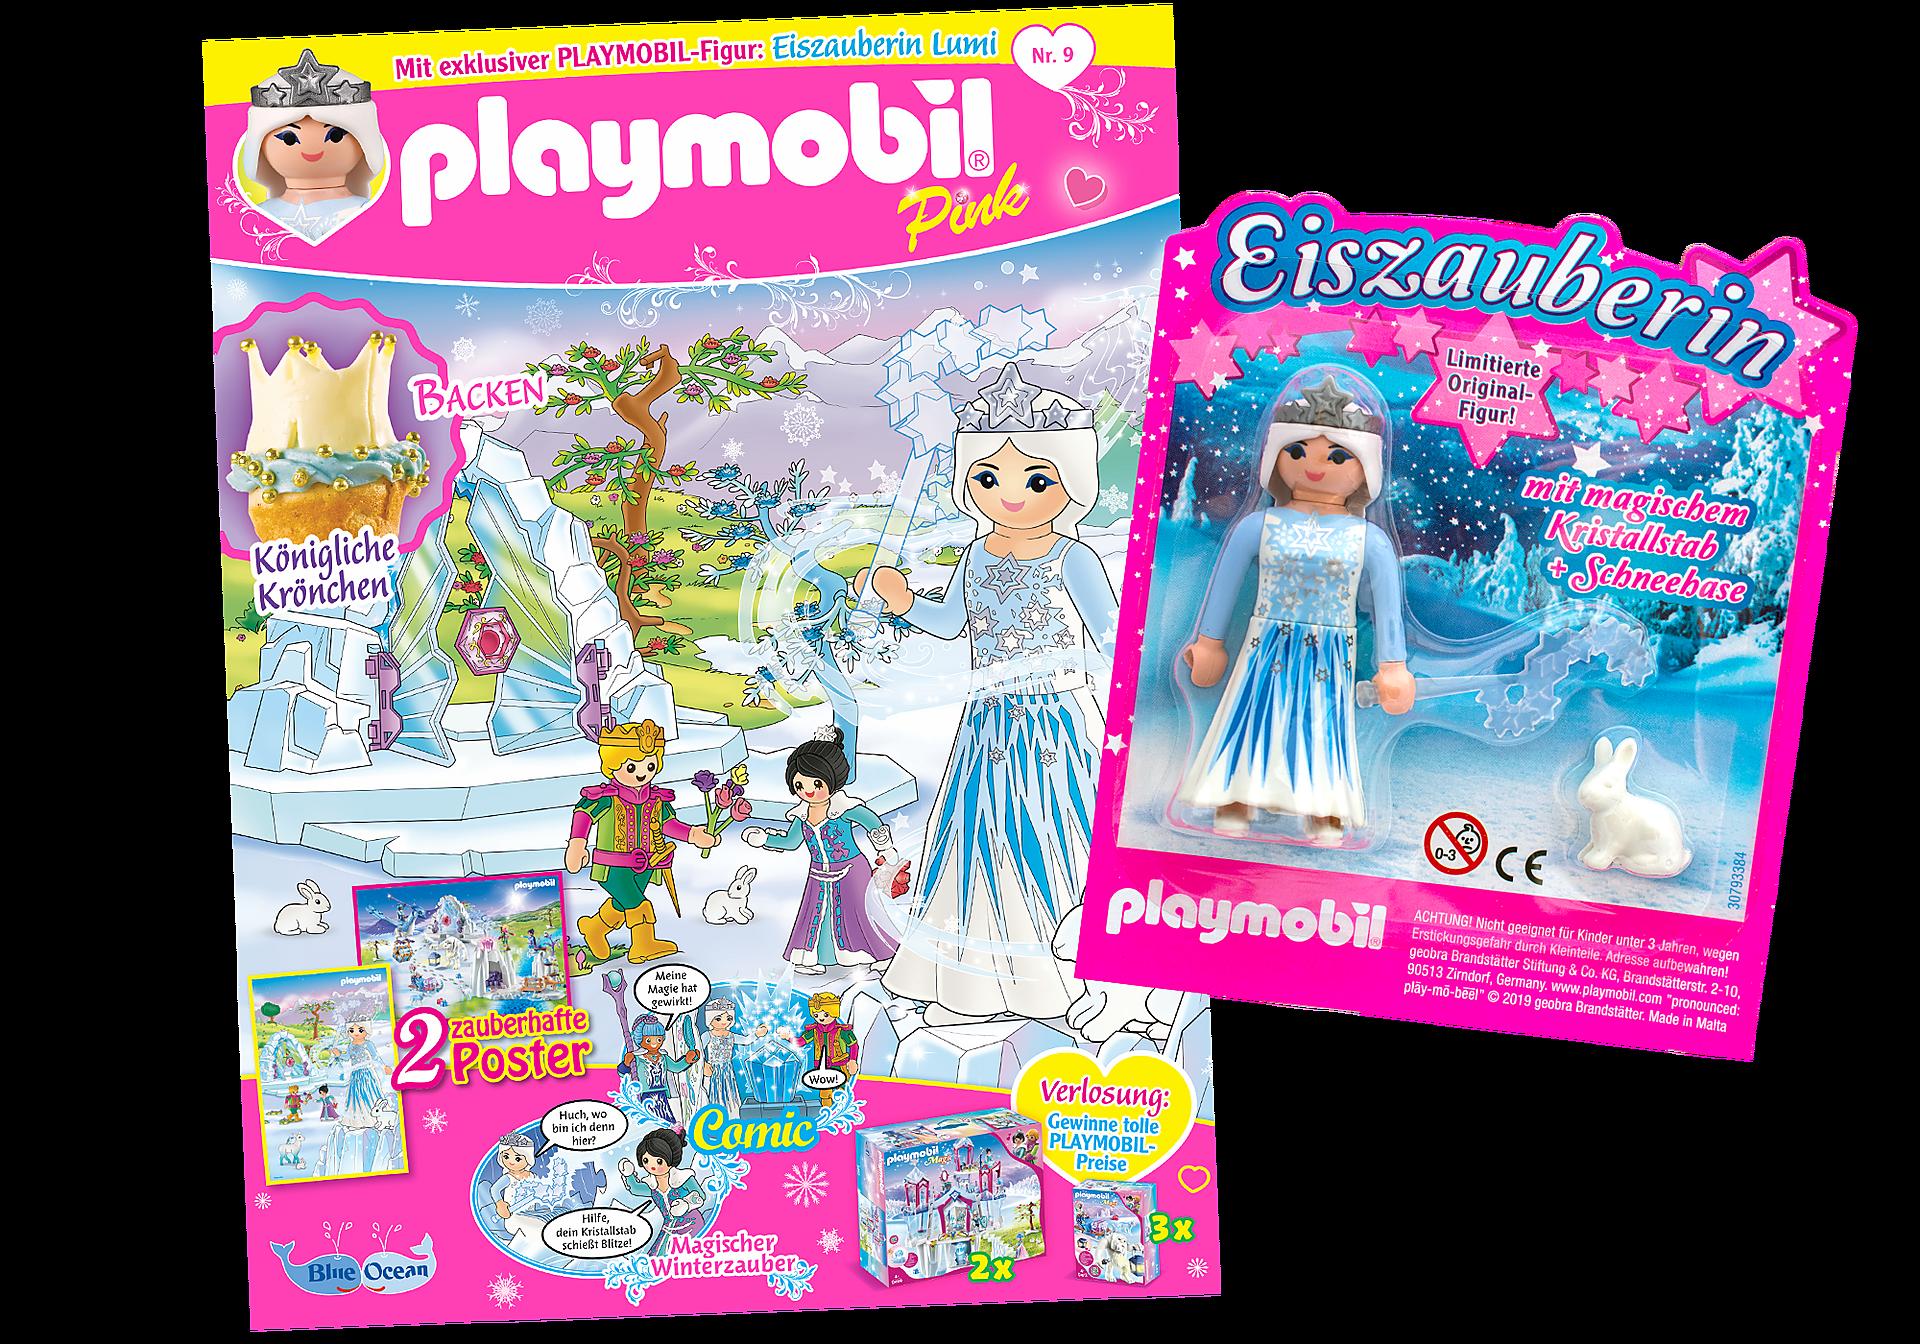 http://media.playmobil.com/i/playmobil/80639_product_detail/PLAYMOBIL-Magazin Pink 9/2019 (Heft 49)